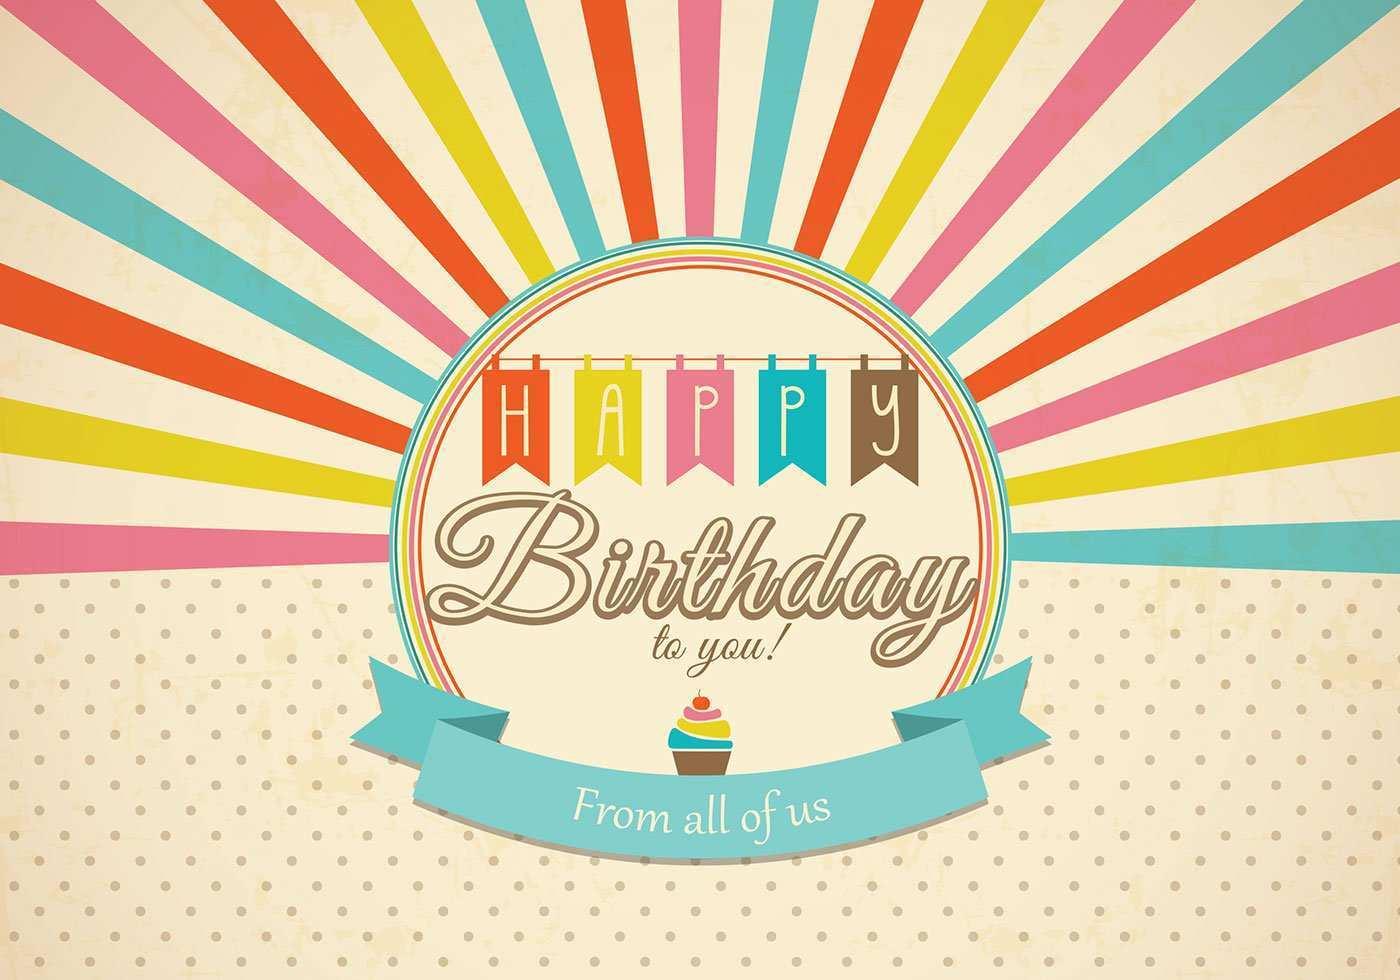 38 Blank Birthday Card Vintage Template Download with Birthday Card Vintage Template